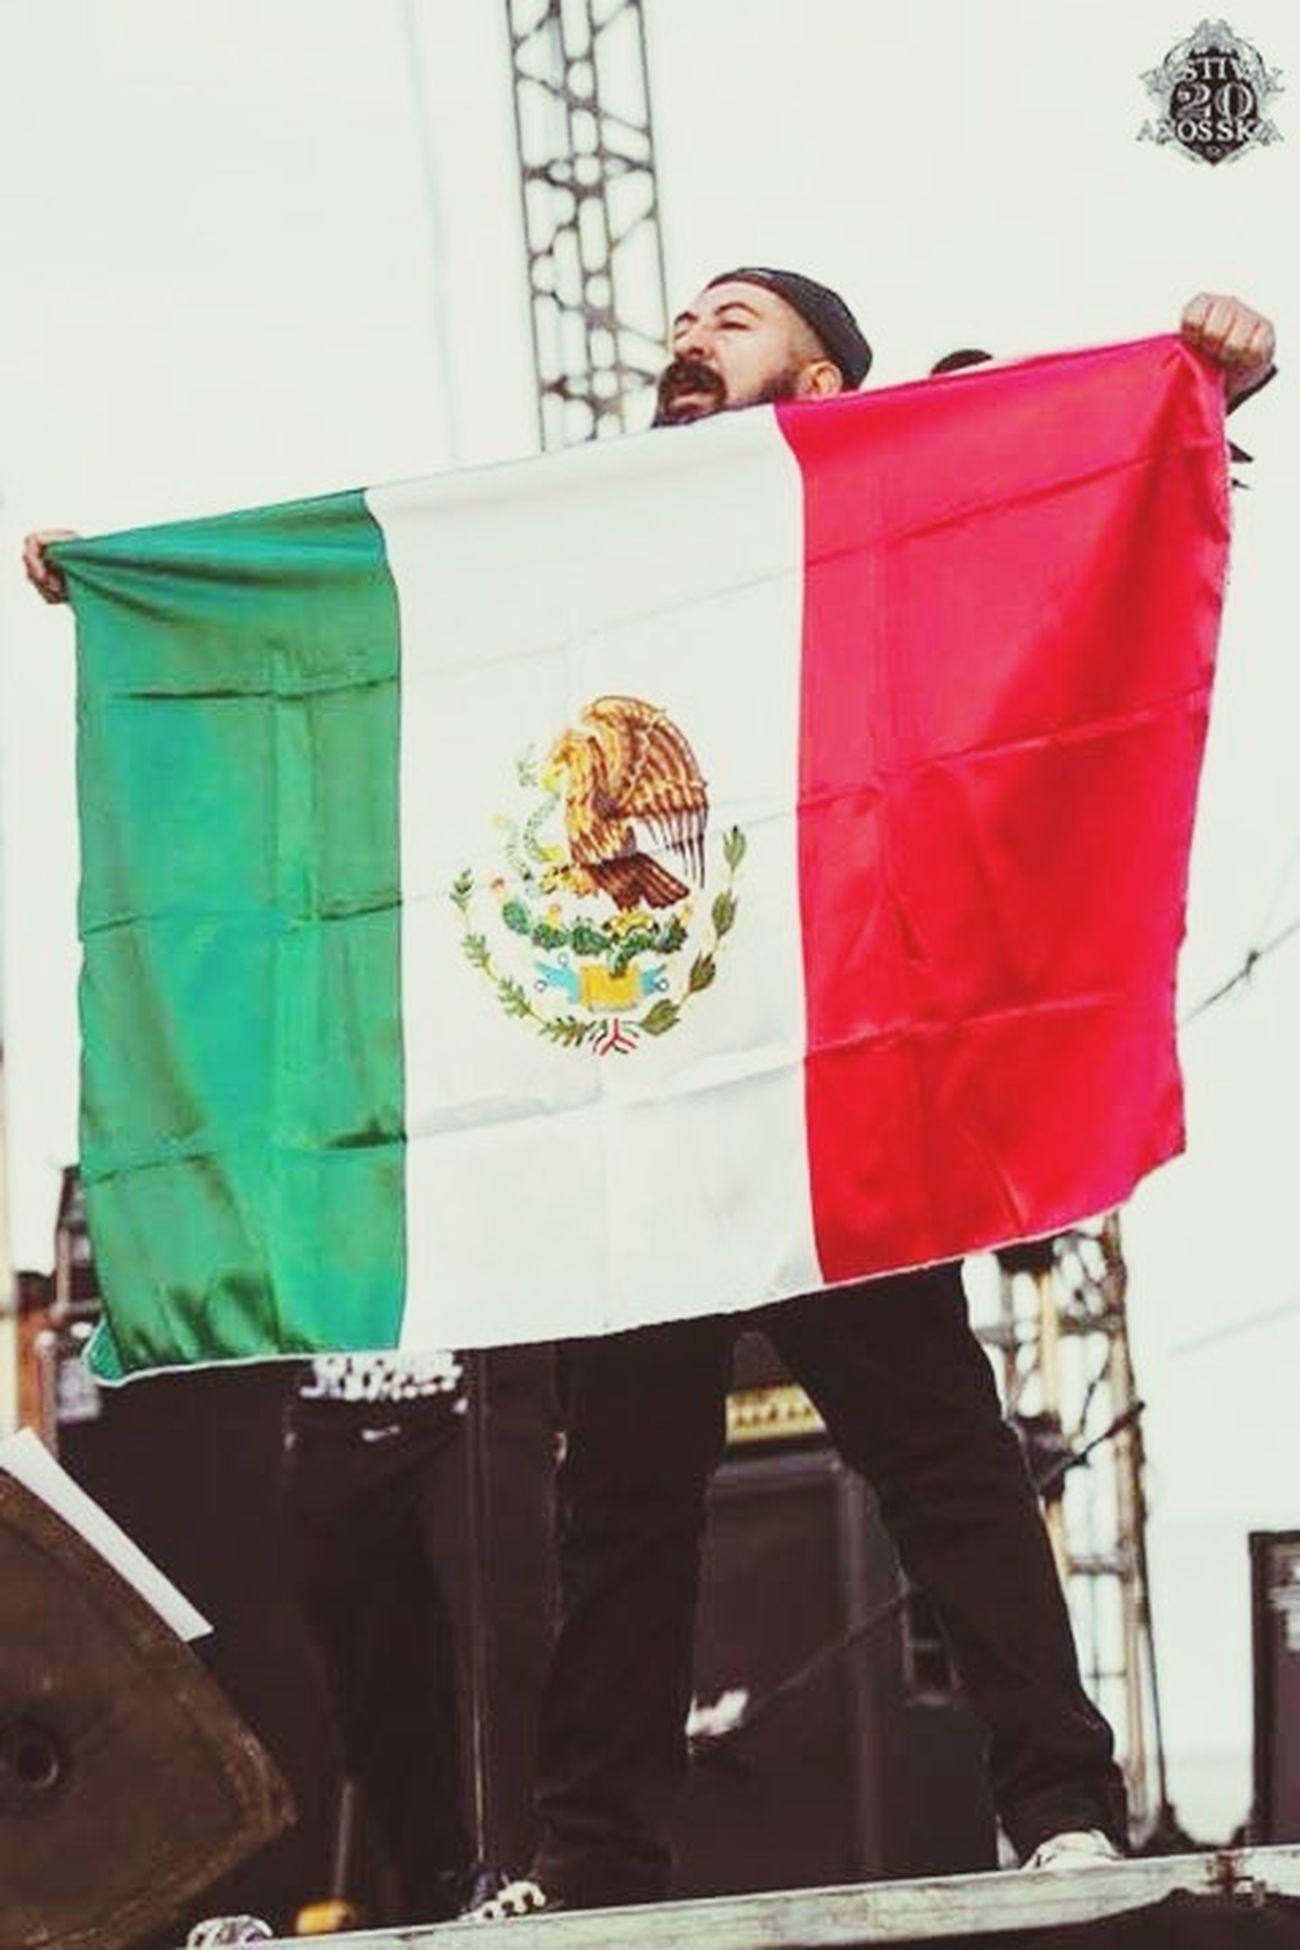 Looking Into The Future Vamos Mexico! Hoy juega México ❤️❤️❤️❤️⚽️🏆🏆 Fifa